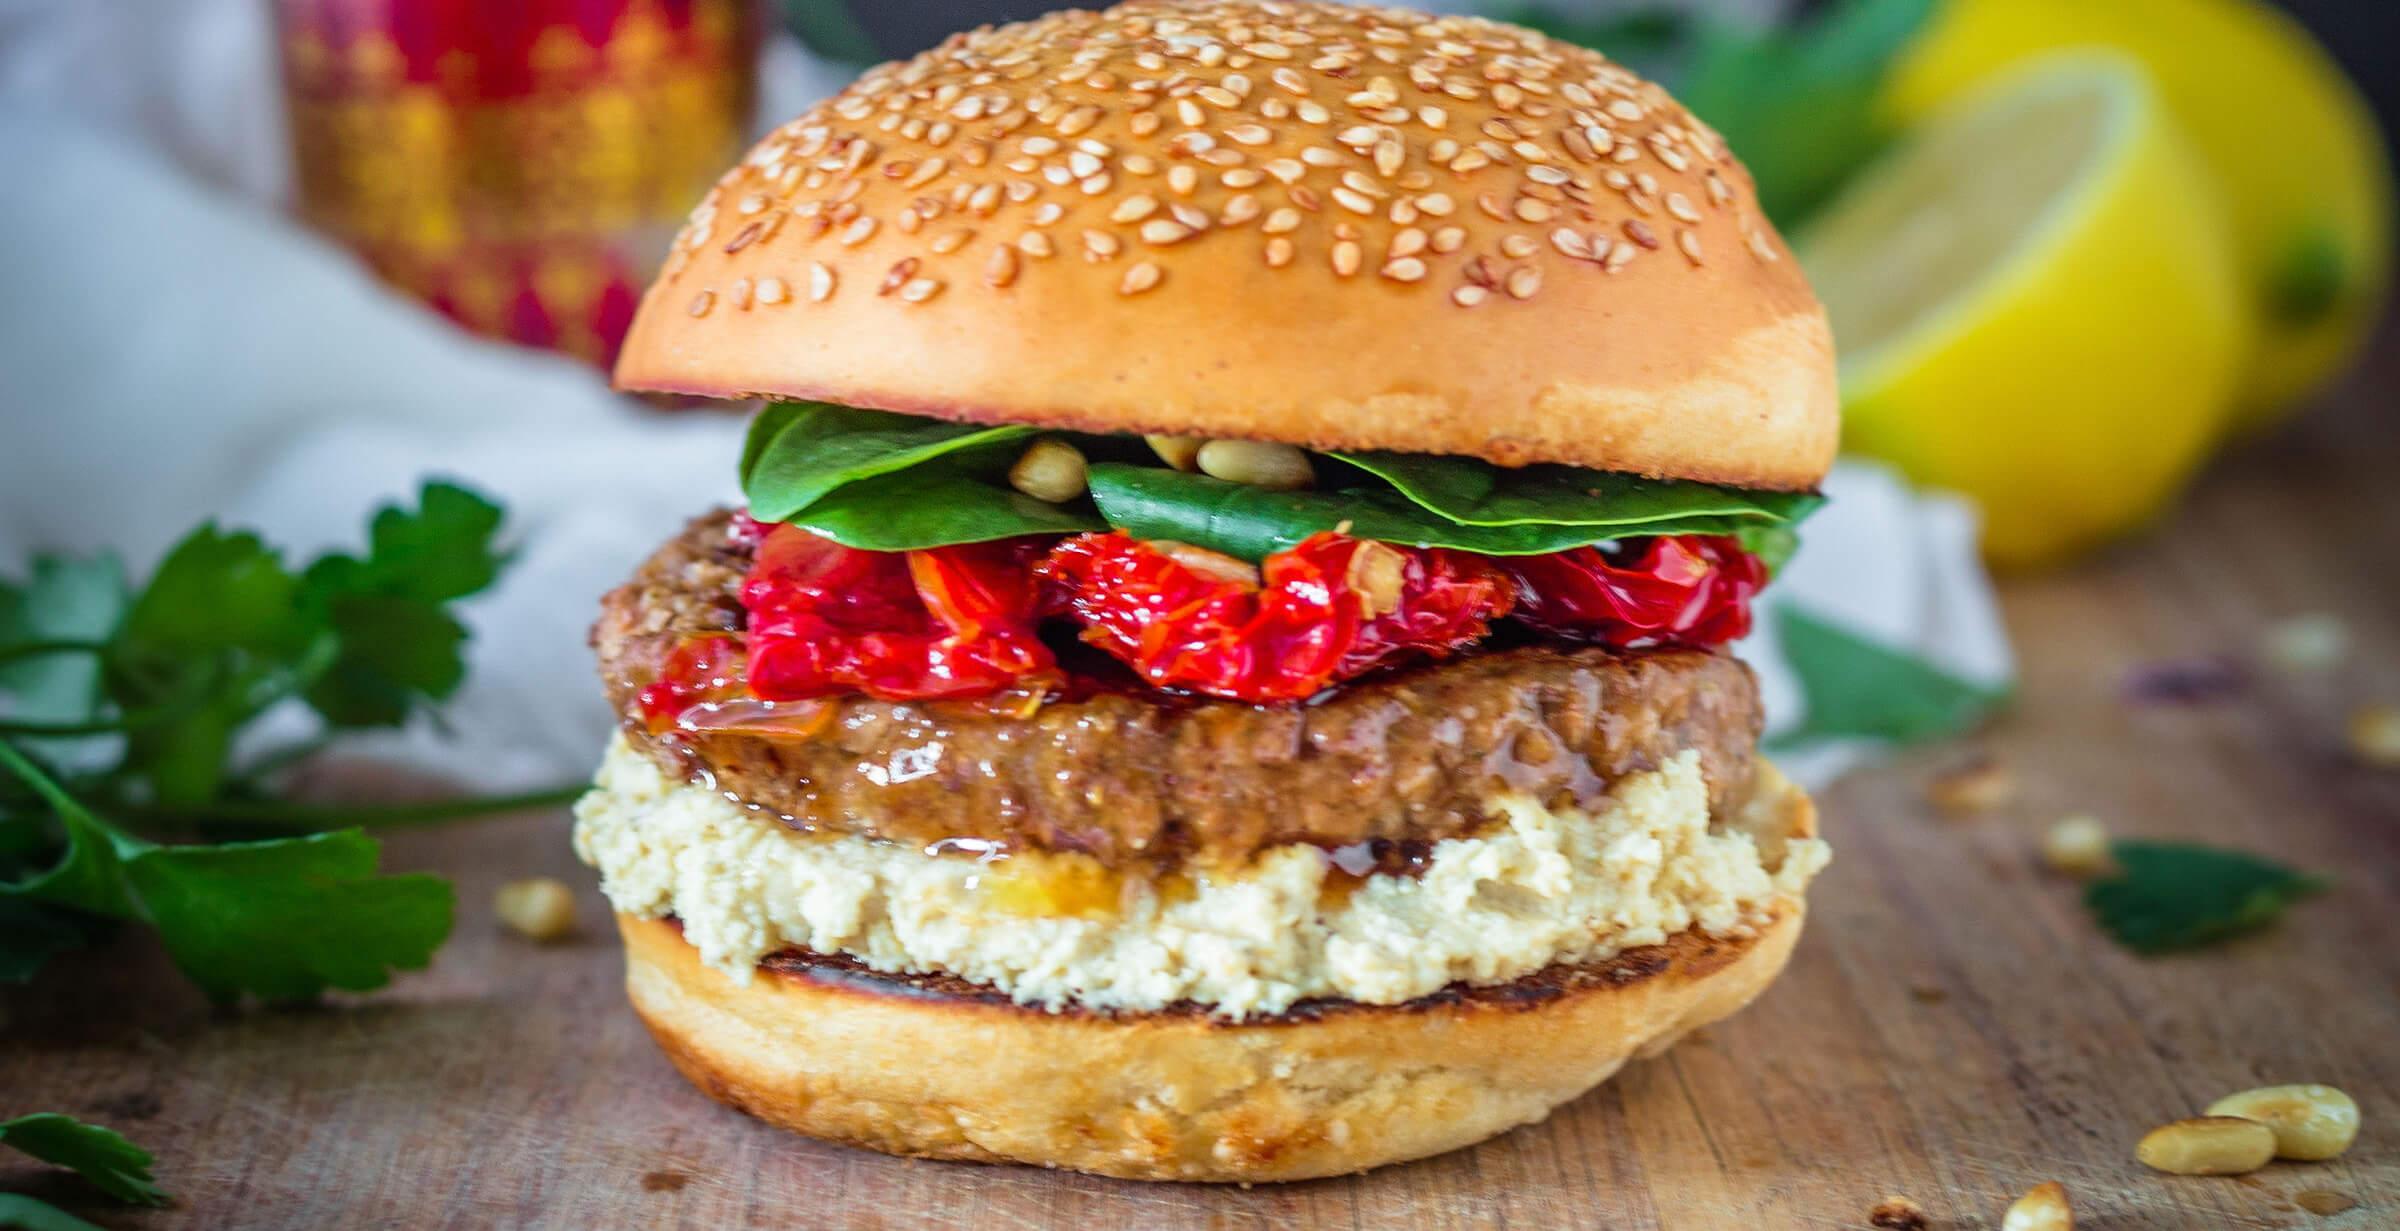 Lebanese burger